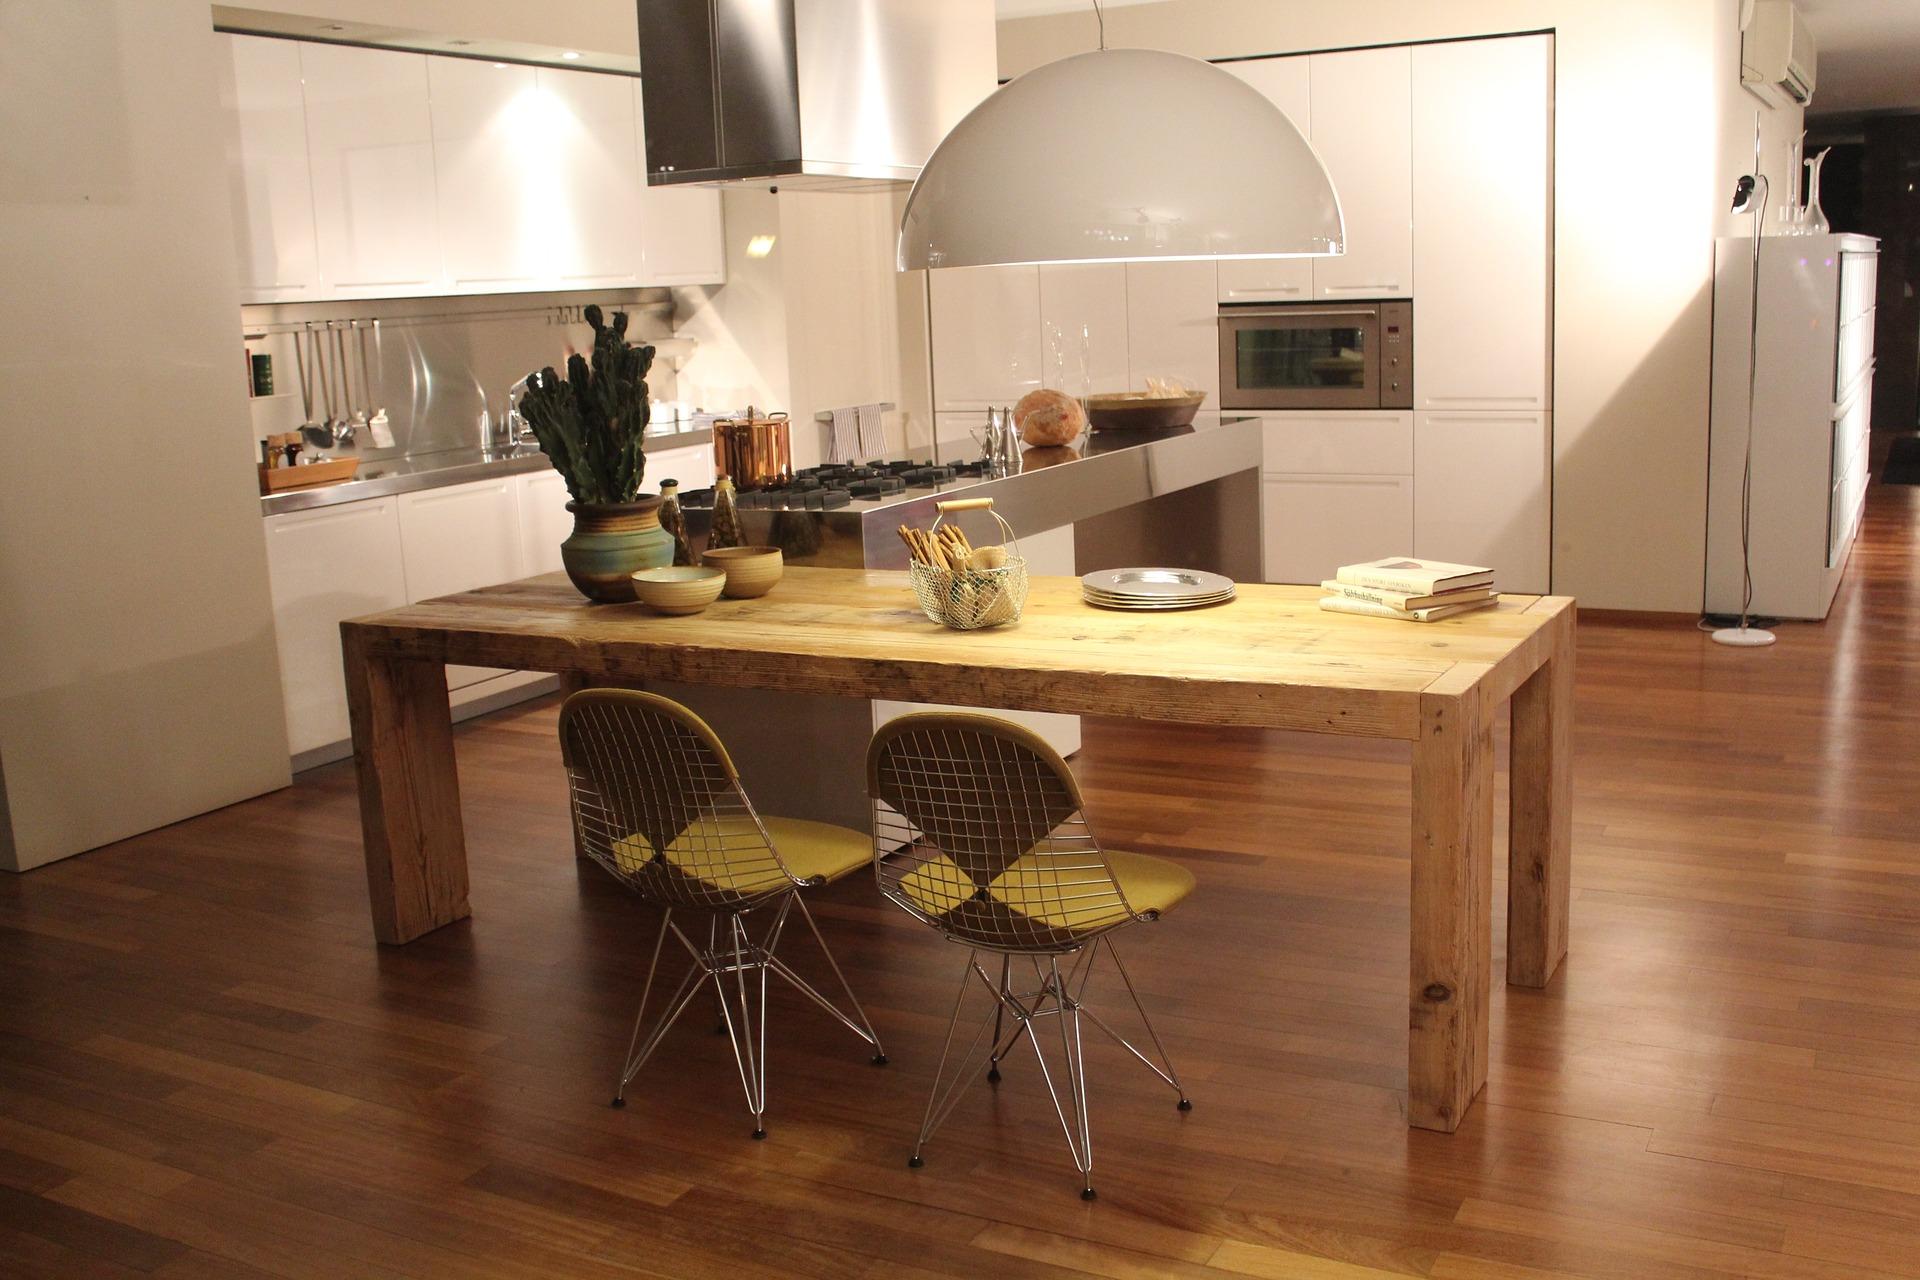 modern retro kitchen with warm wood tones